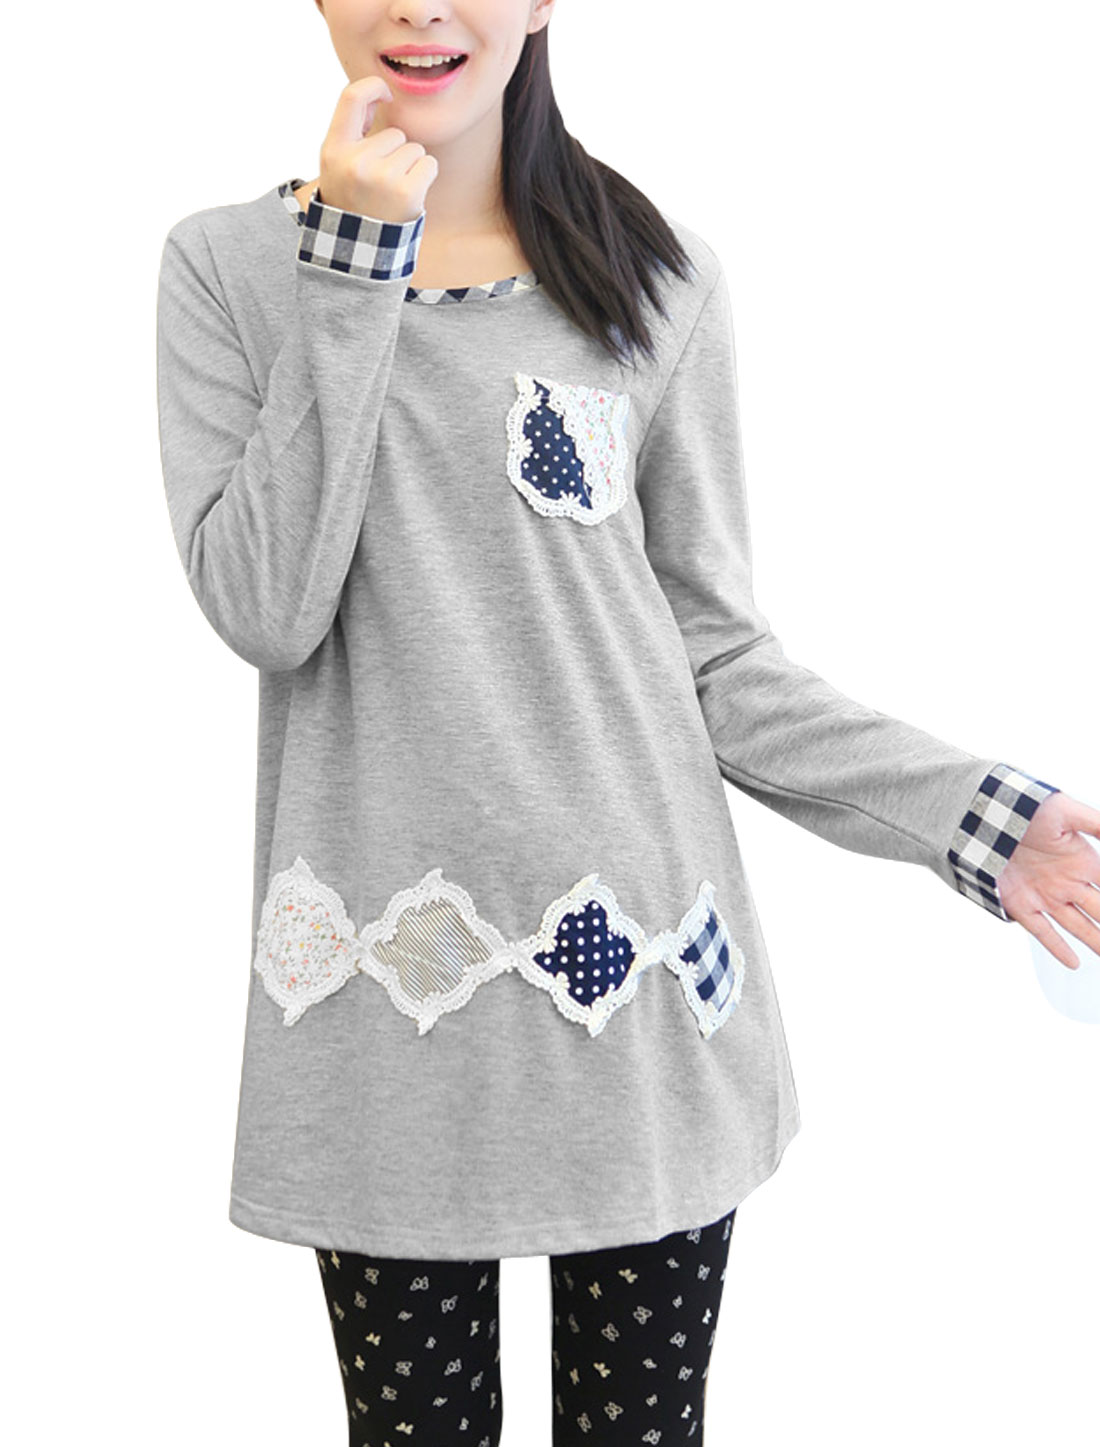 Maternity Applique Pattern One Bust Pocket Round Hem T-shirt Light Gray M